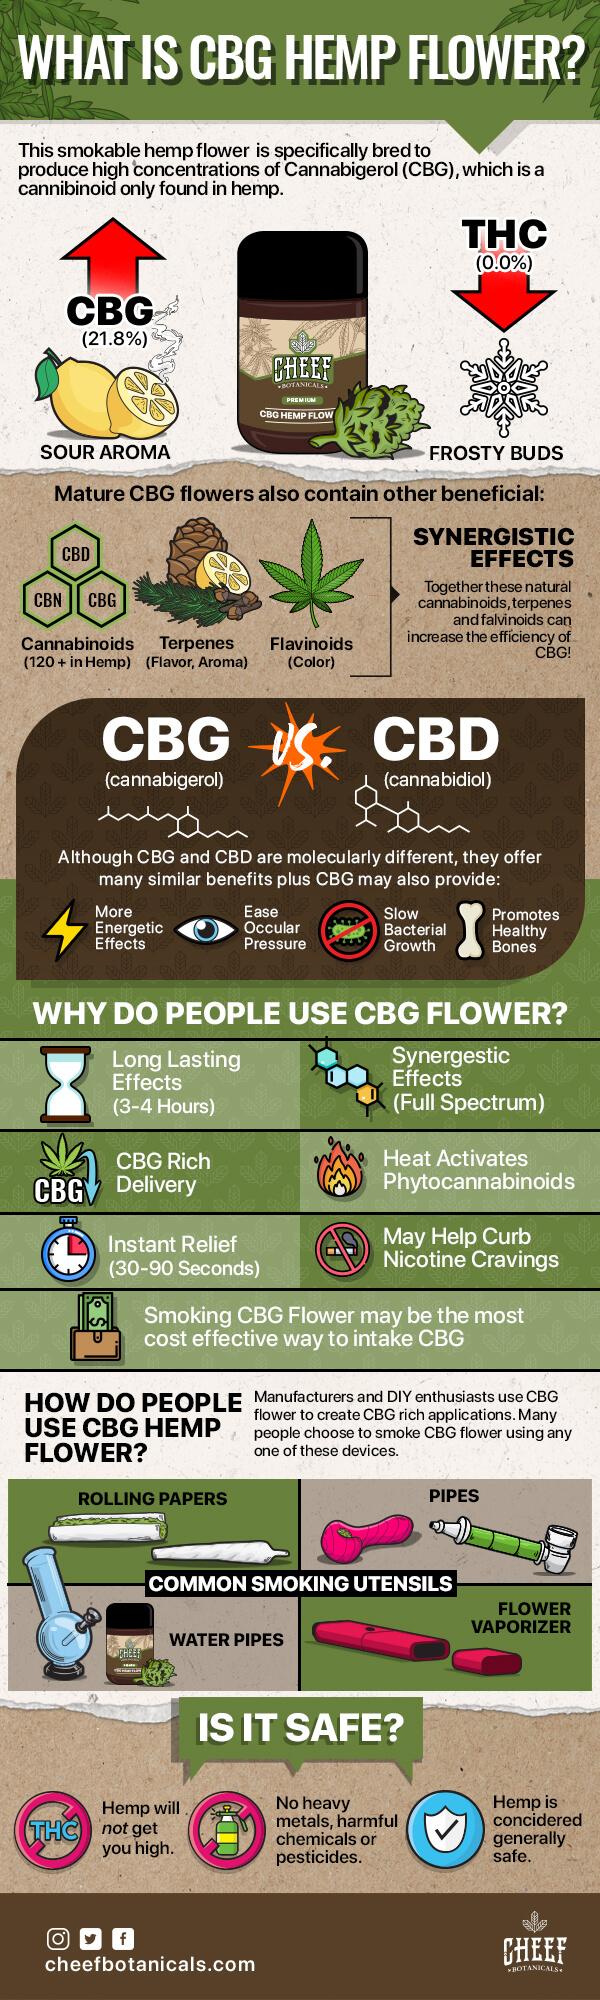 CBG-hemp-flower-infographic-plaza